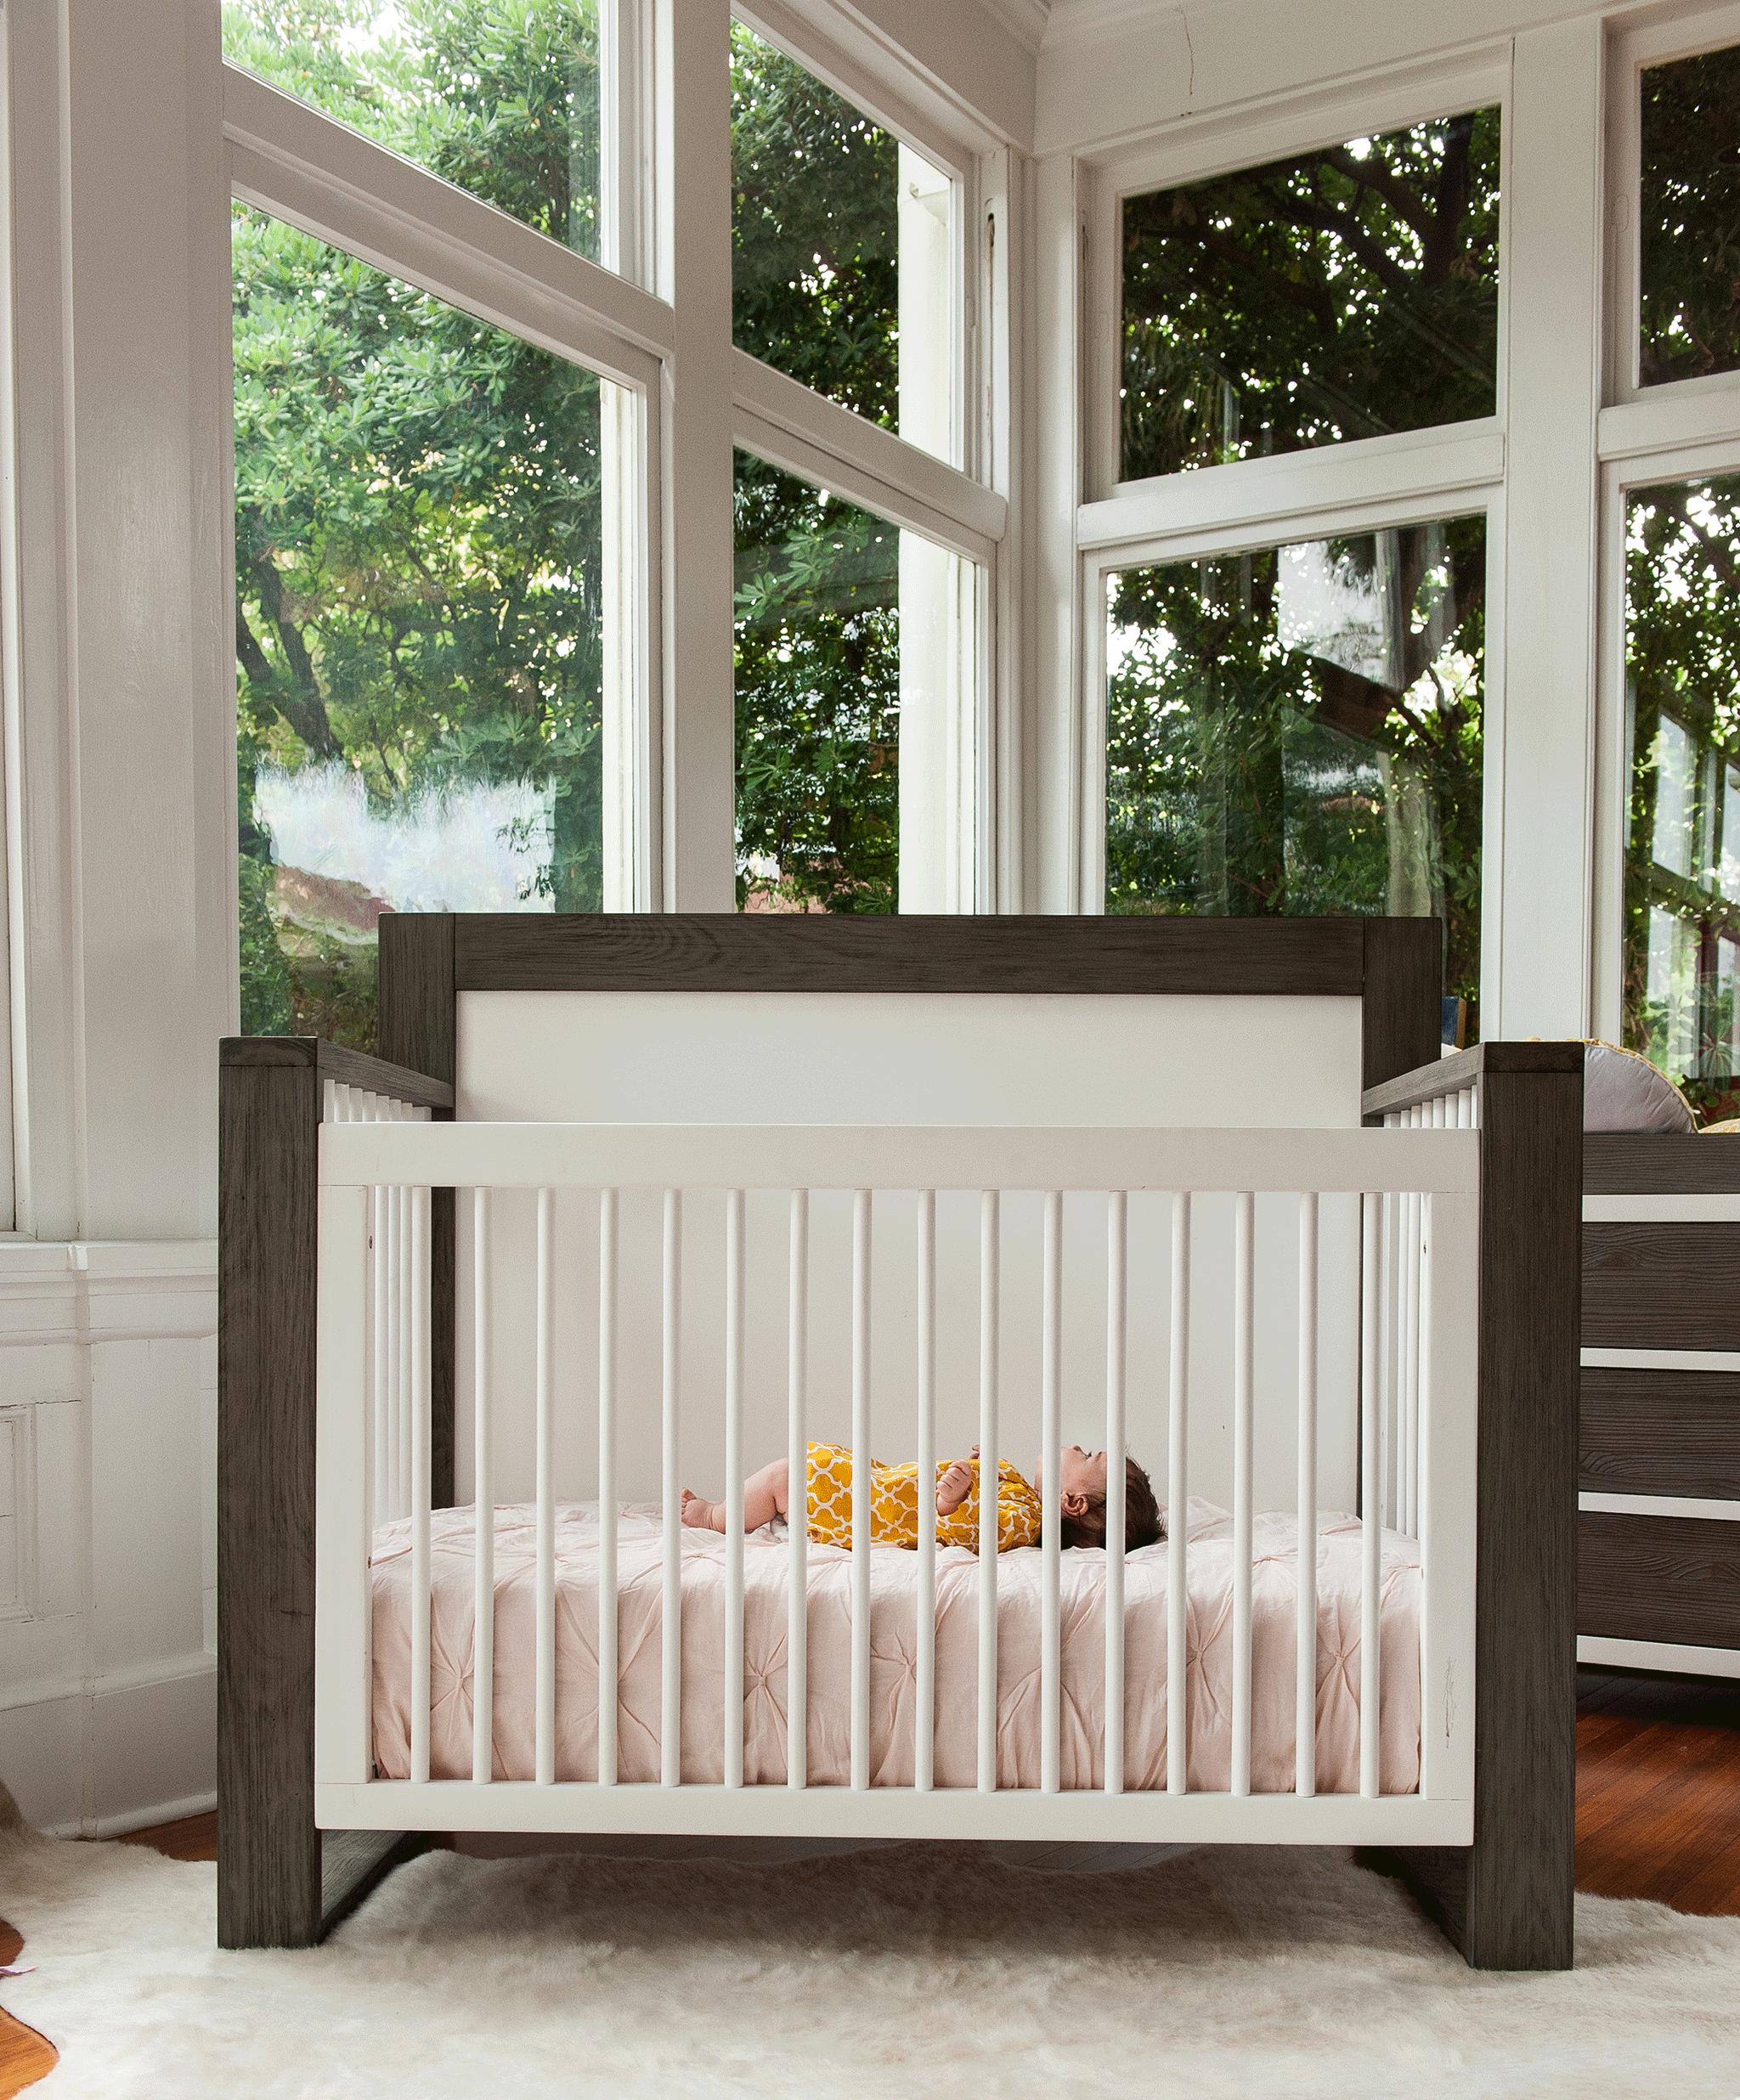 True Convertible Crib - Milk Street Baby